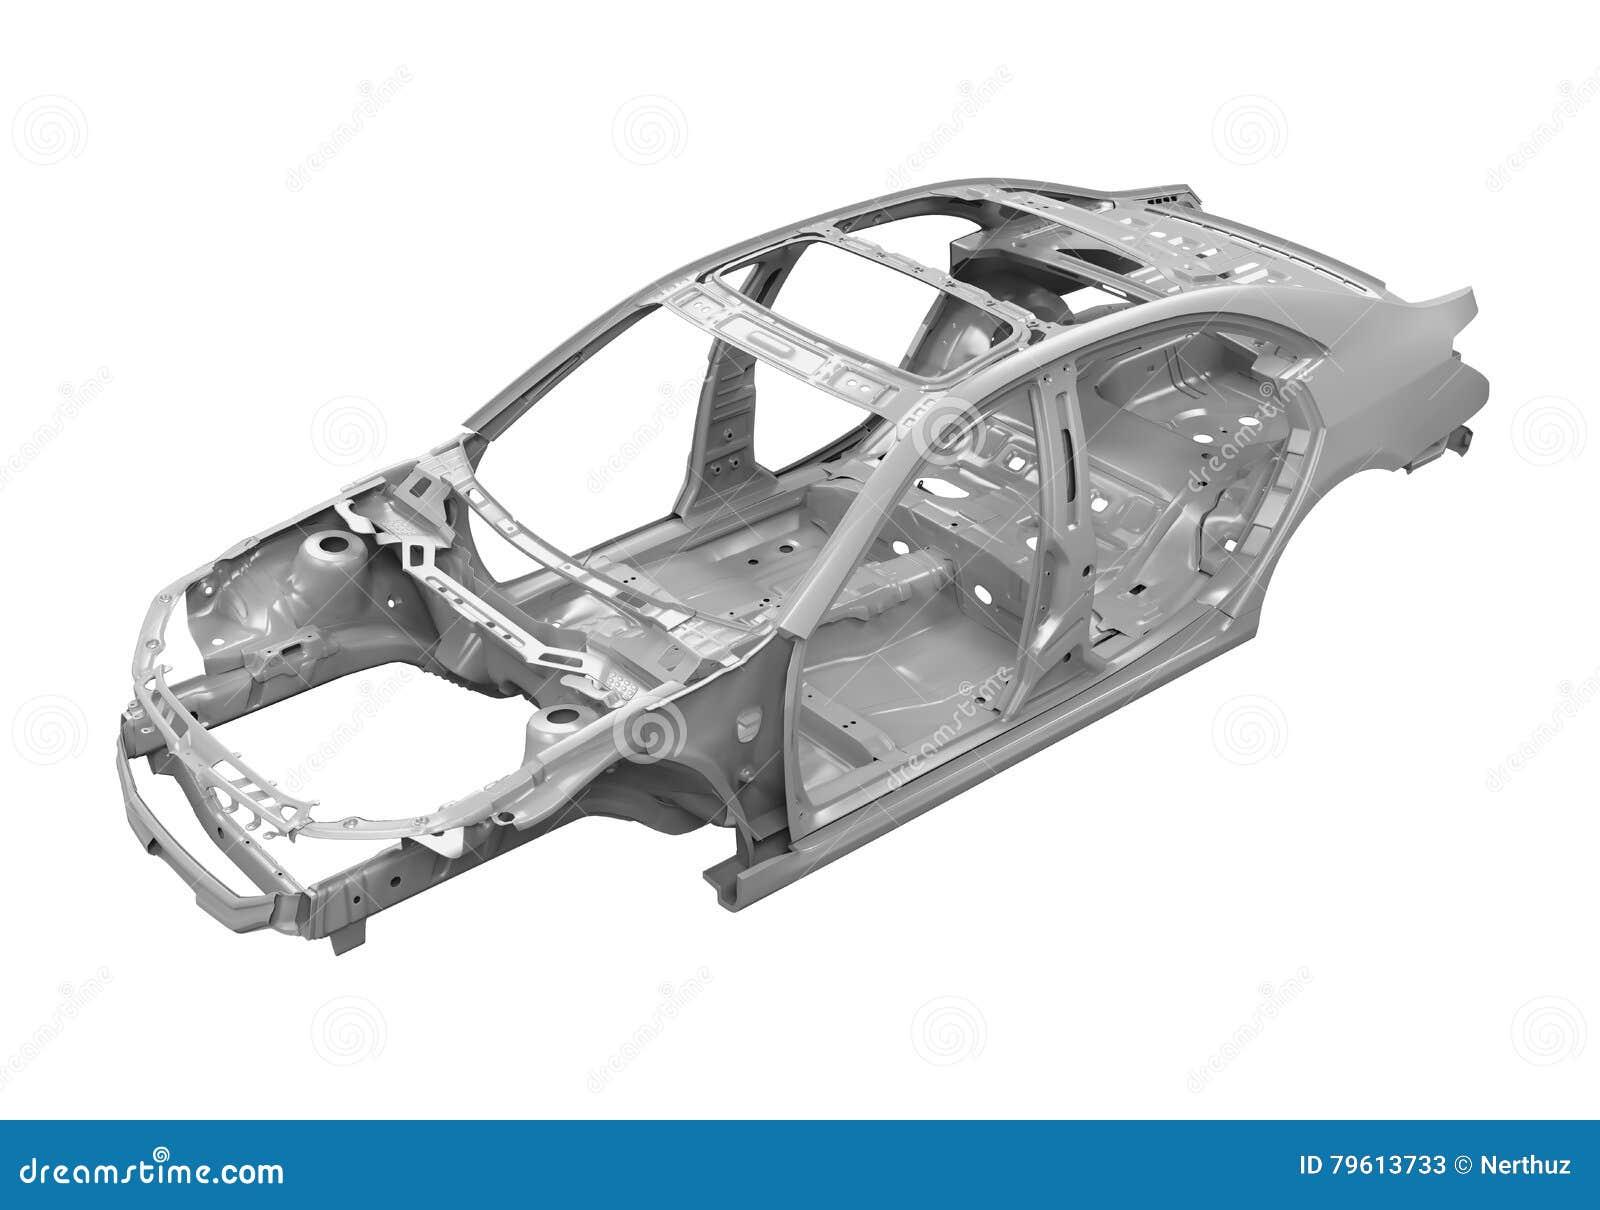 ch ssis de voiture d 39 unibody image stock image du fuselage machines 79613733. Black Bedroom Furniture Sets. Home Design Ideas